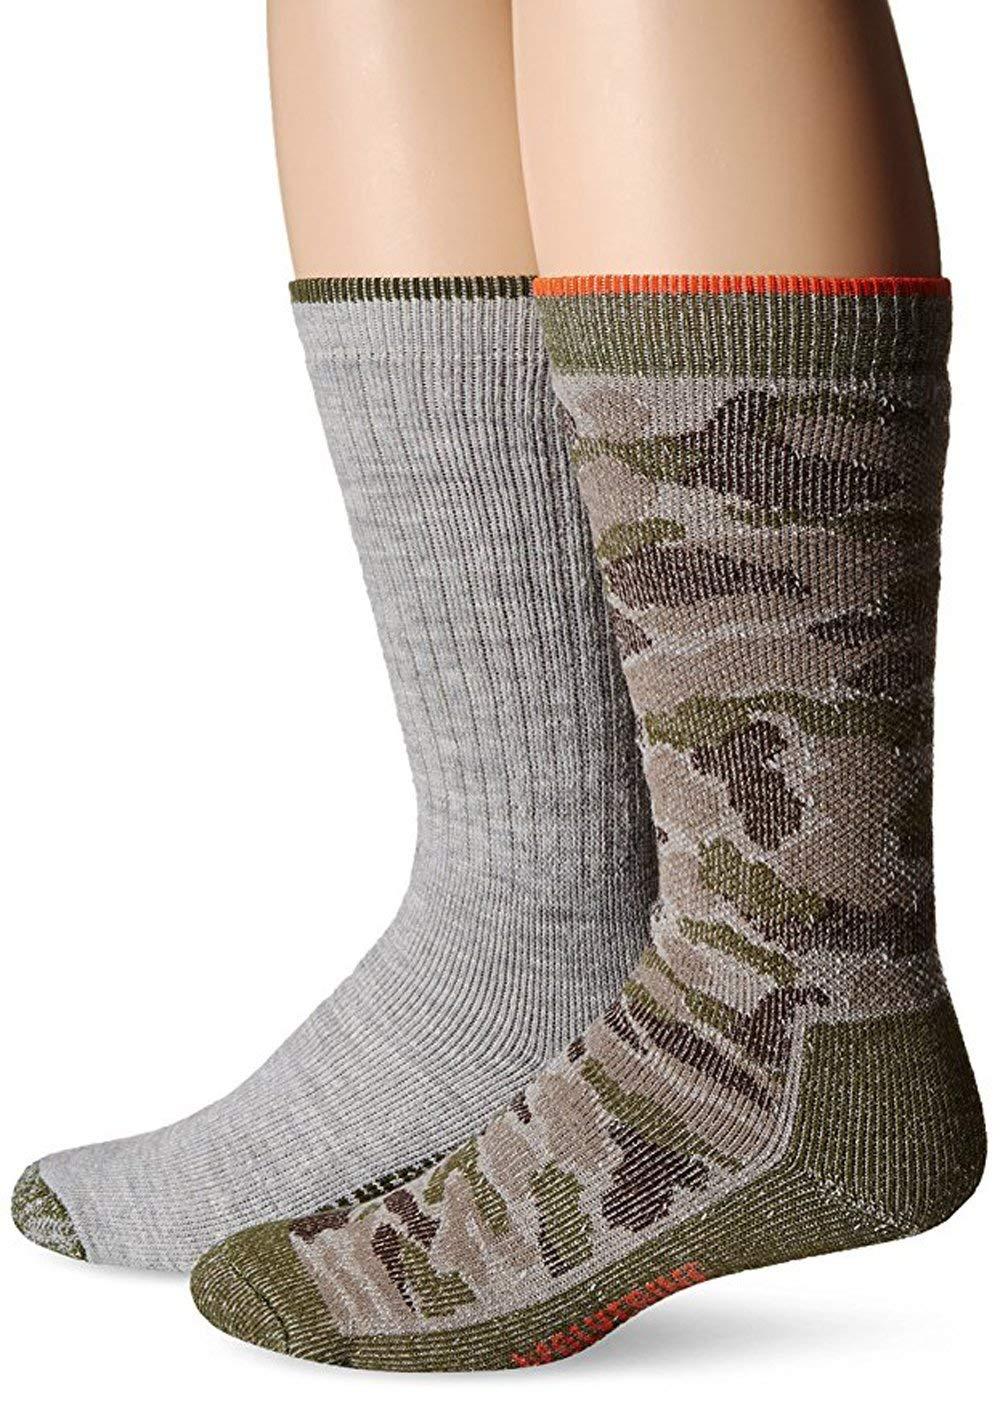 Amazon.com: Wolverine calcetines para hombre camuflaje Full ...